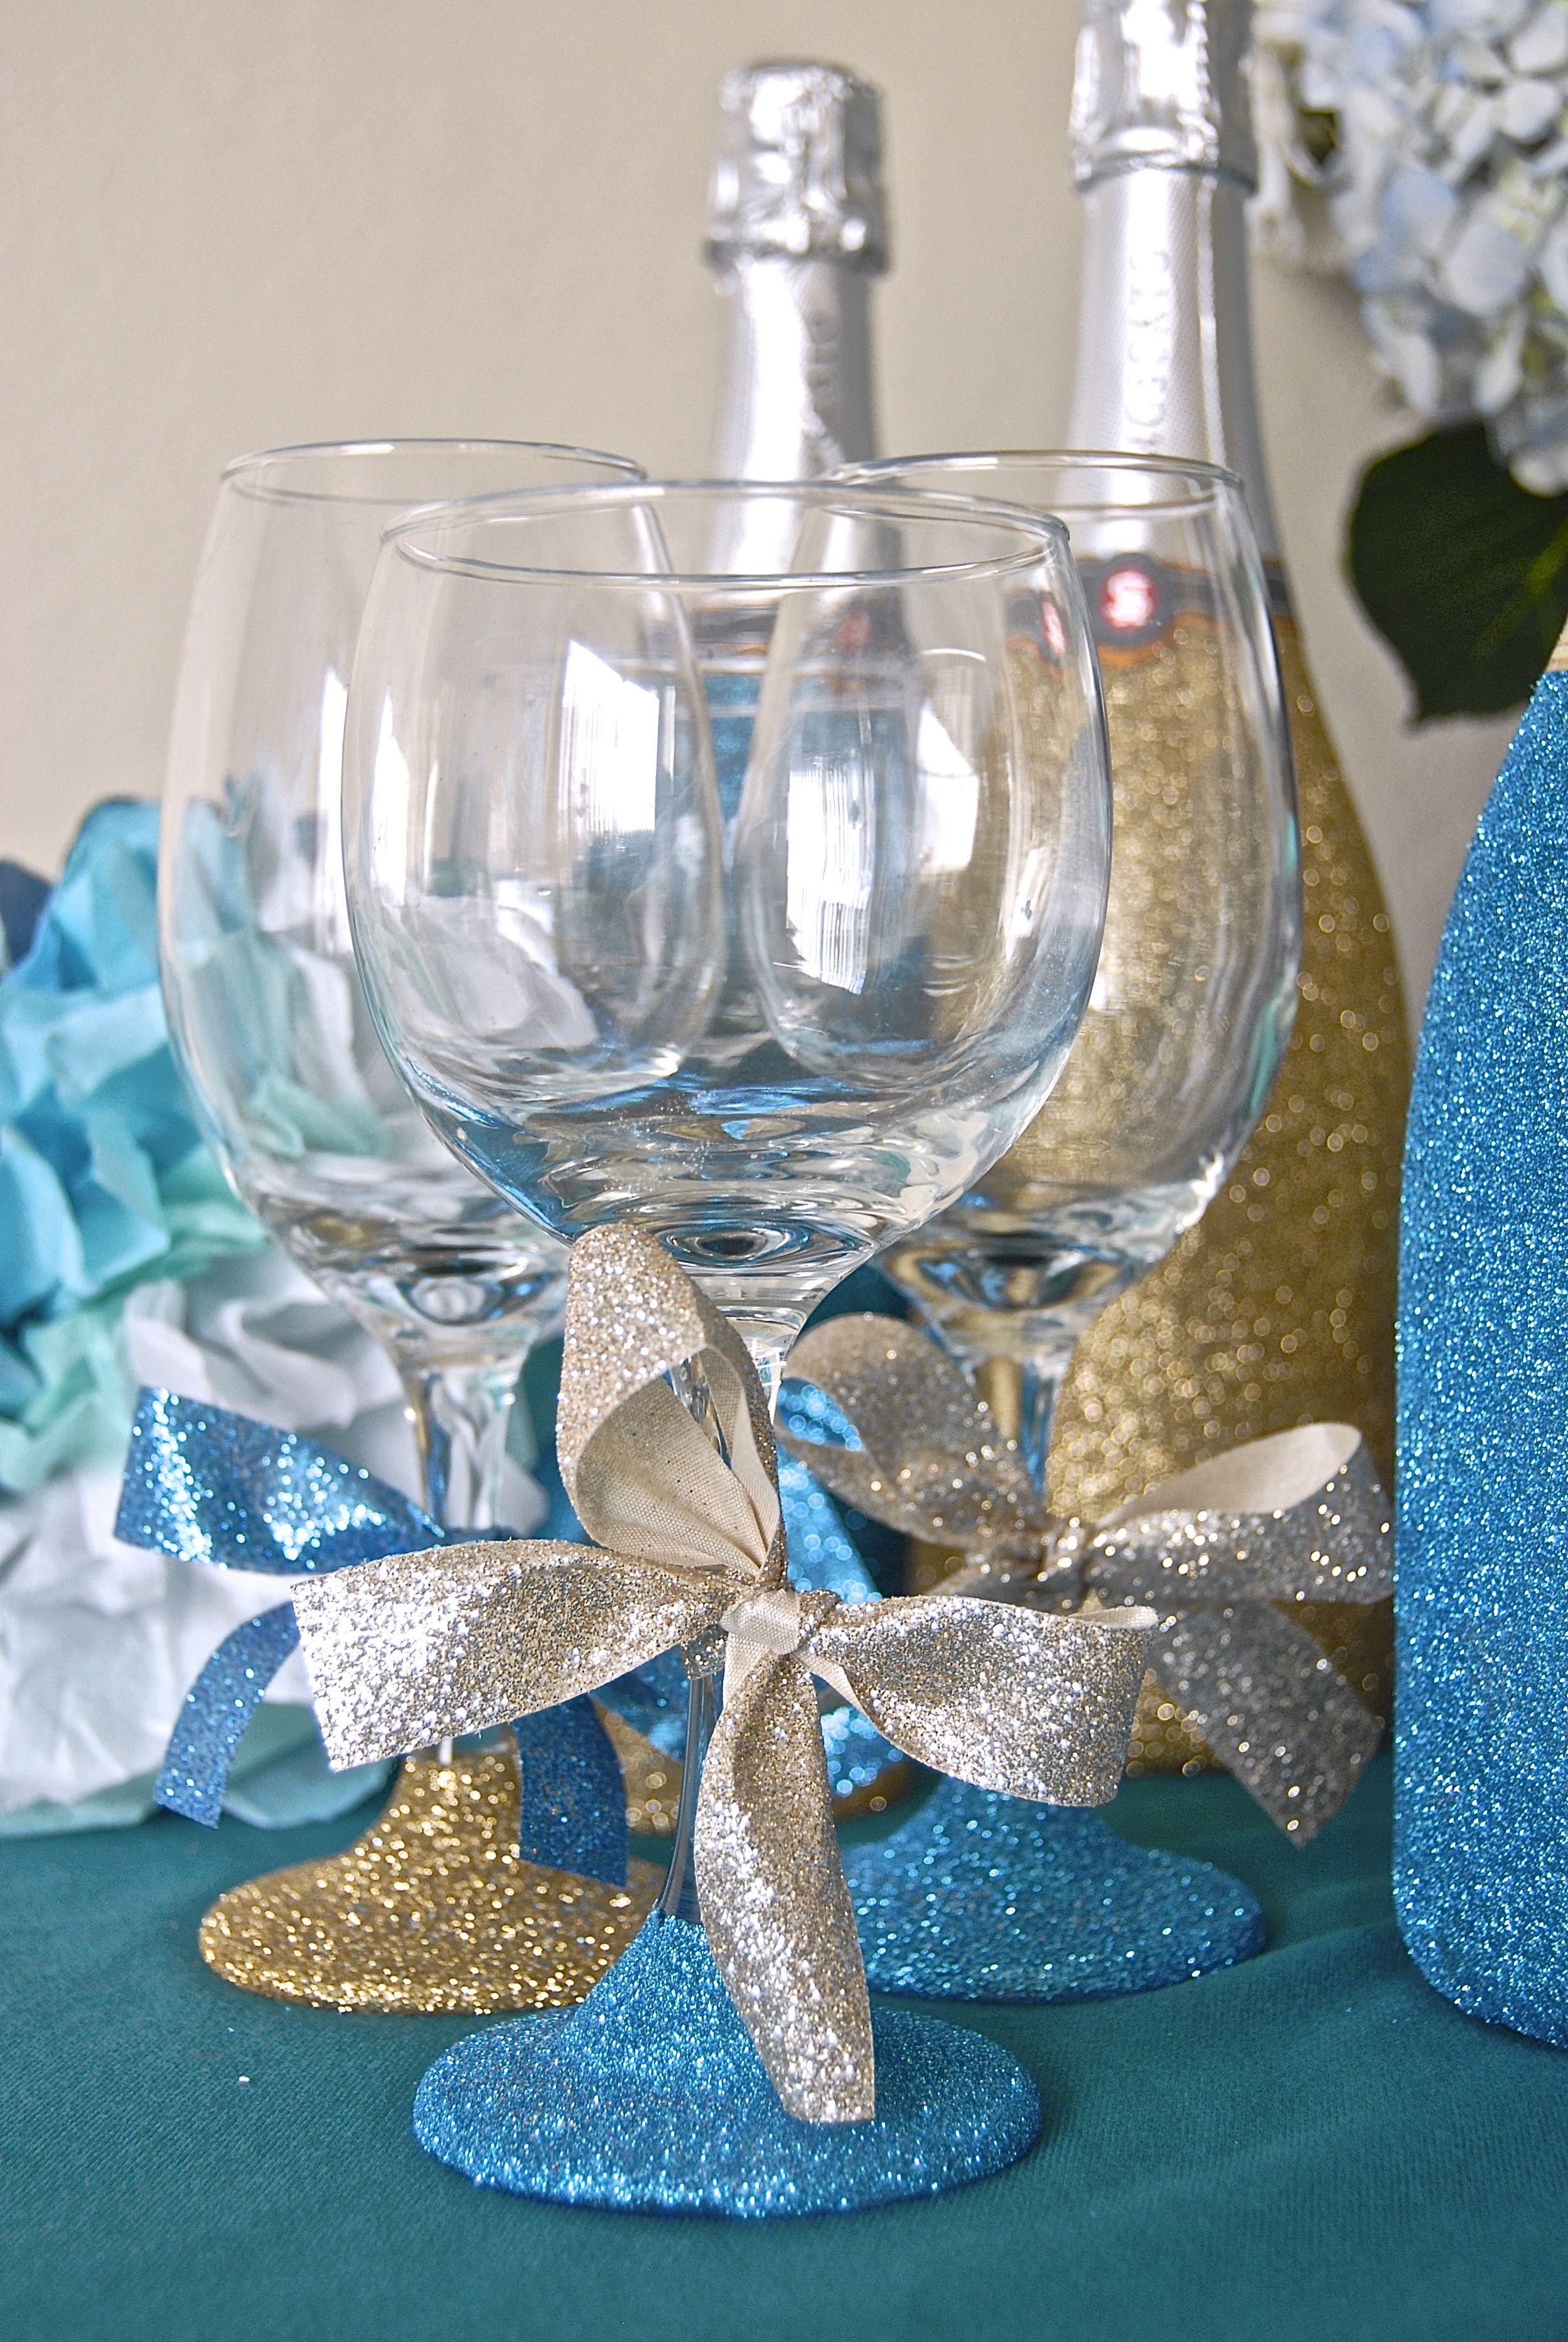 Glitter Bridal Shower Favors -- Decorate wine glasses ...